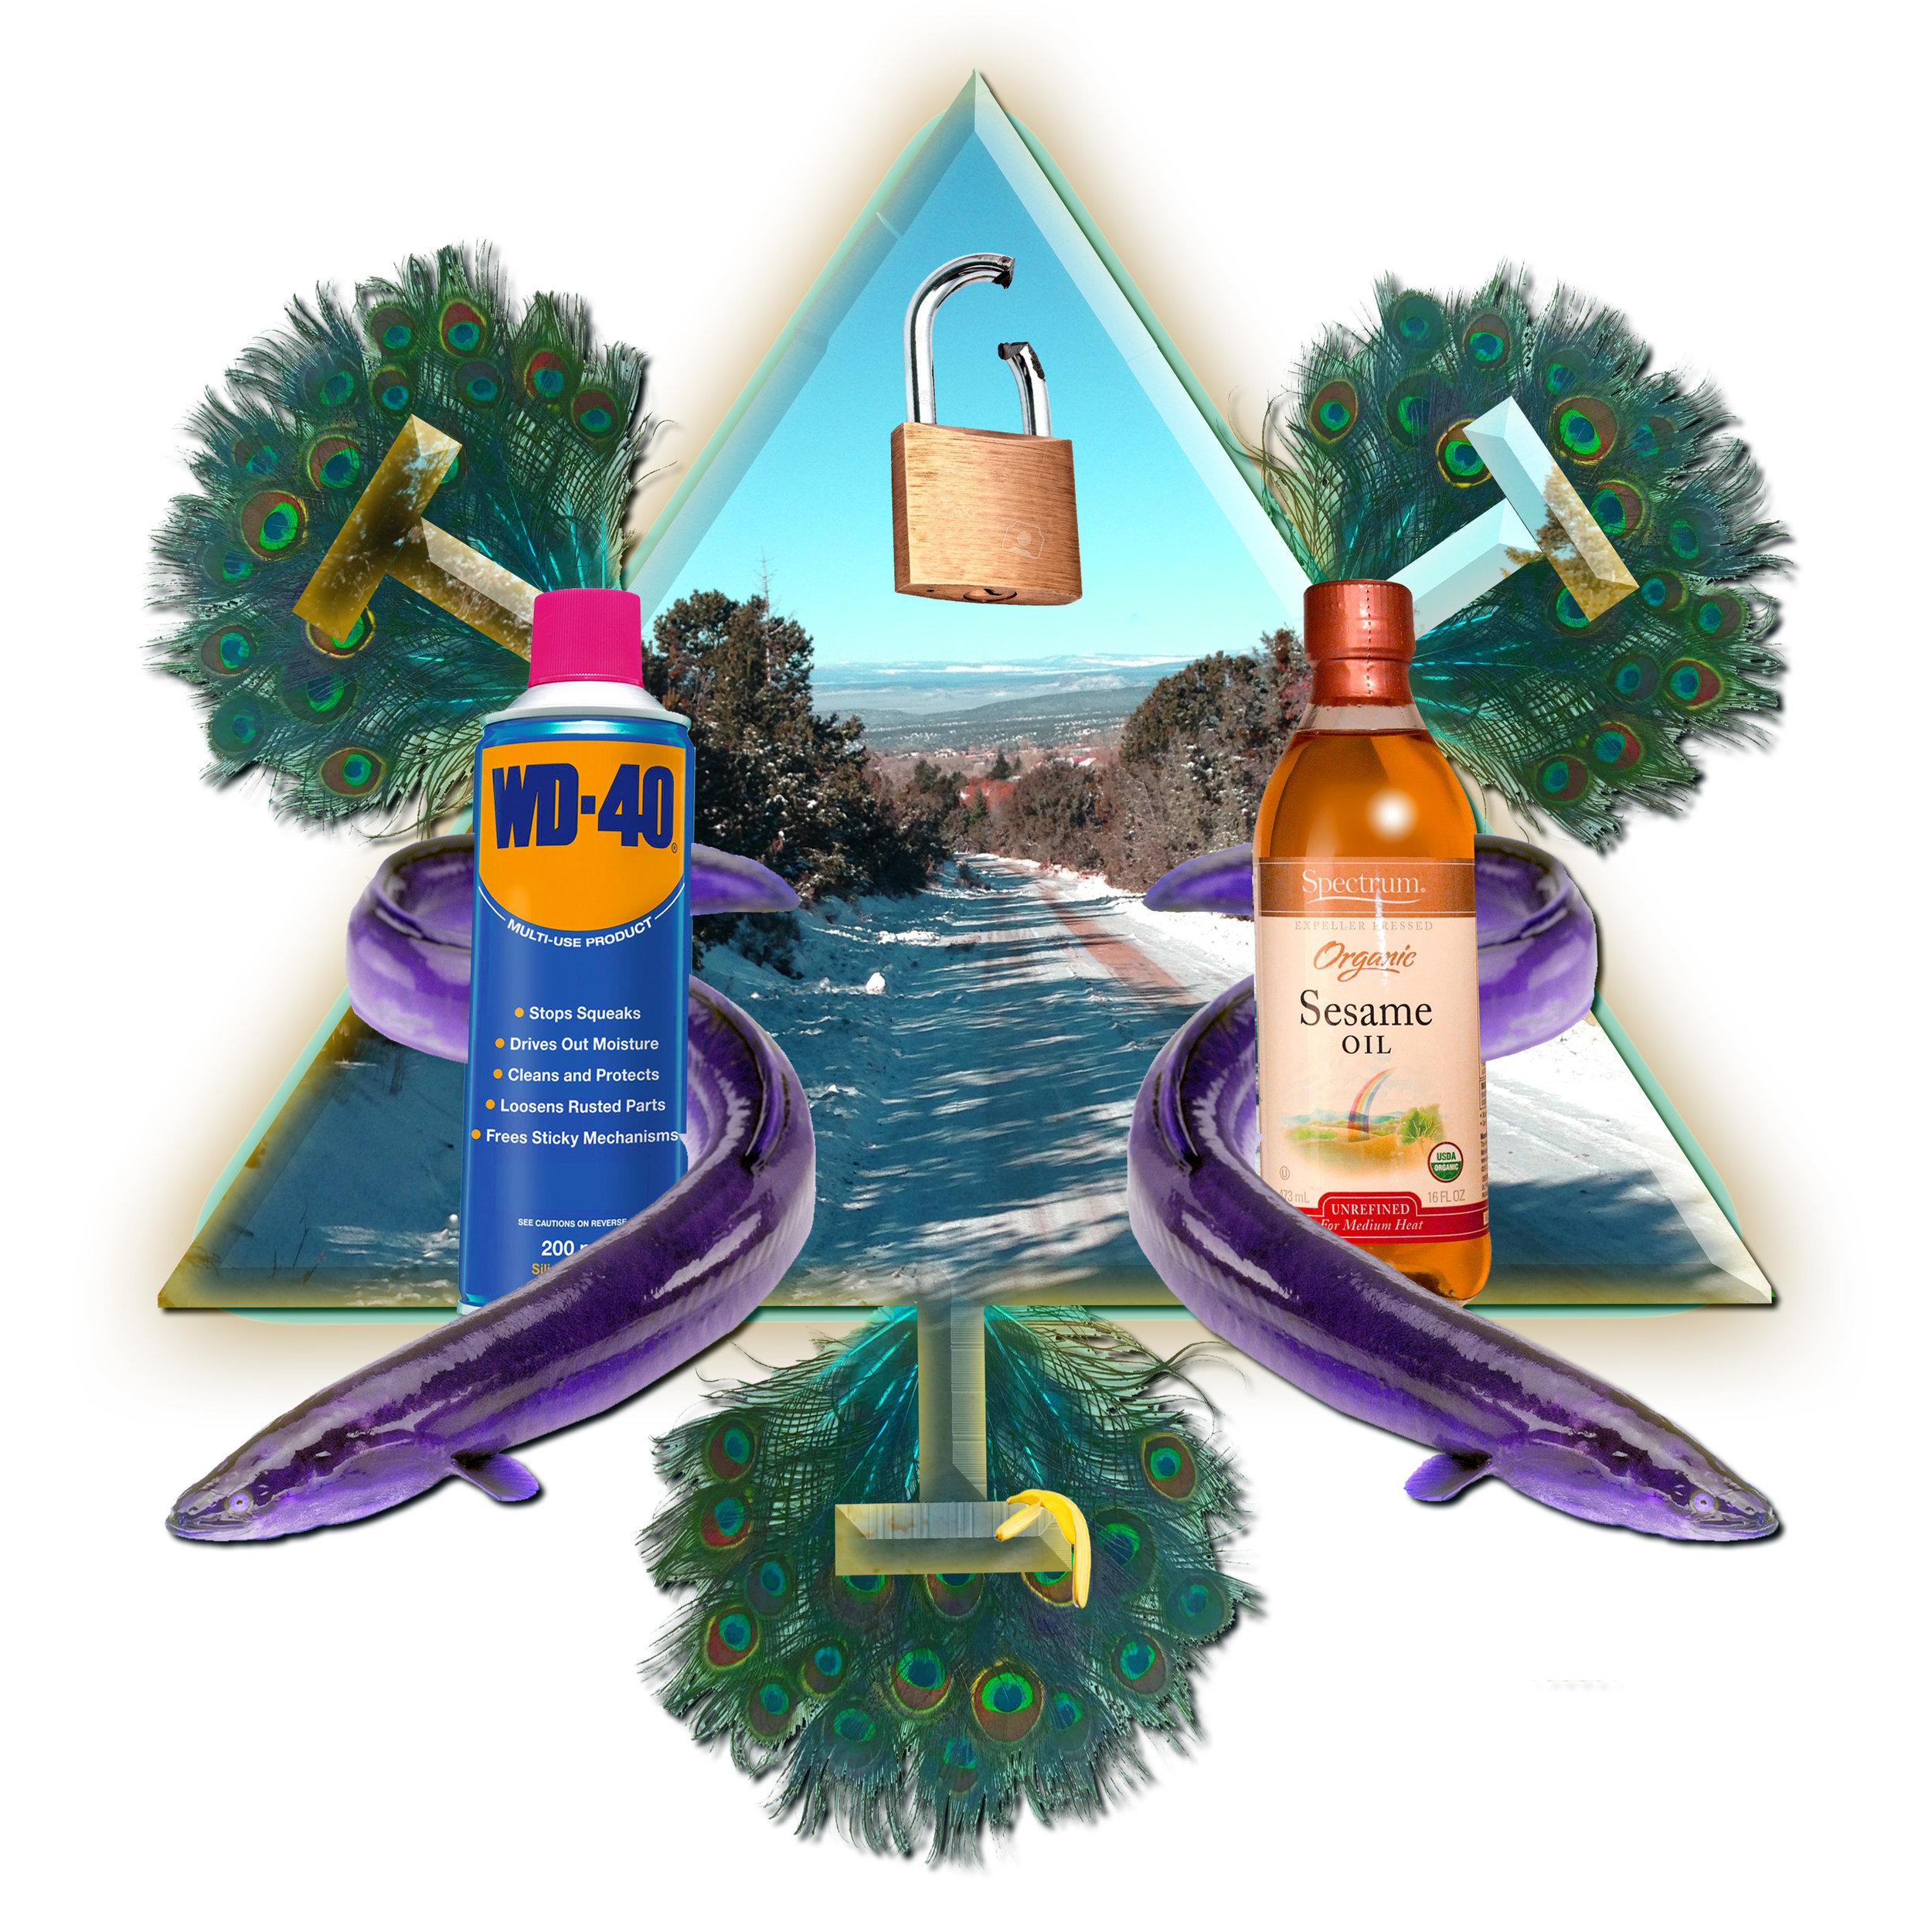 Icy Road  #Achievement  #Unlocked  #opensesame  #peacock  #slipandslide  #mandala  #eel  #bananapeel  #aromatherapy